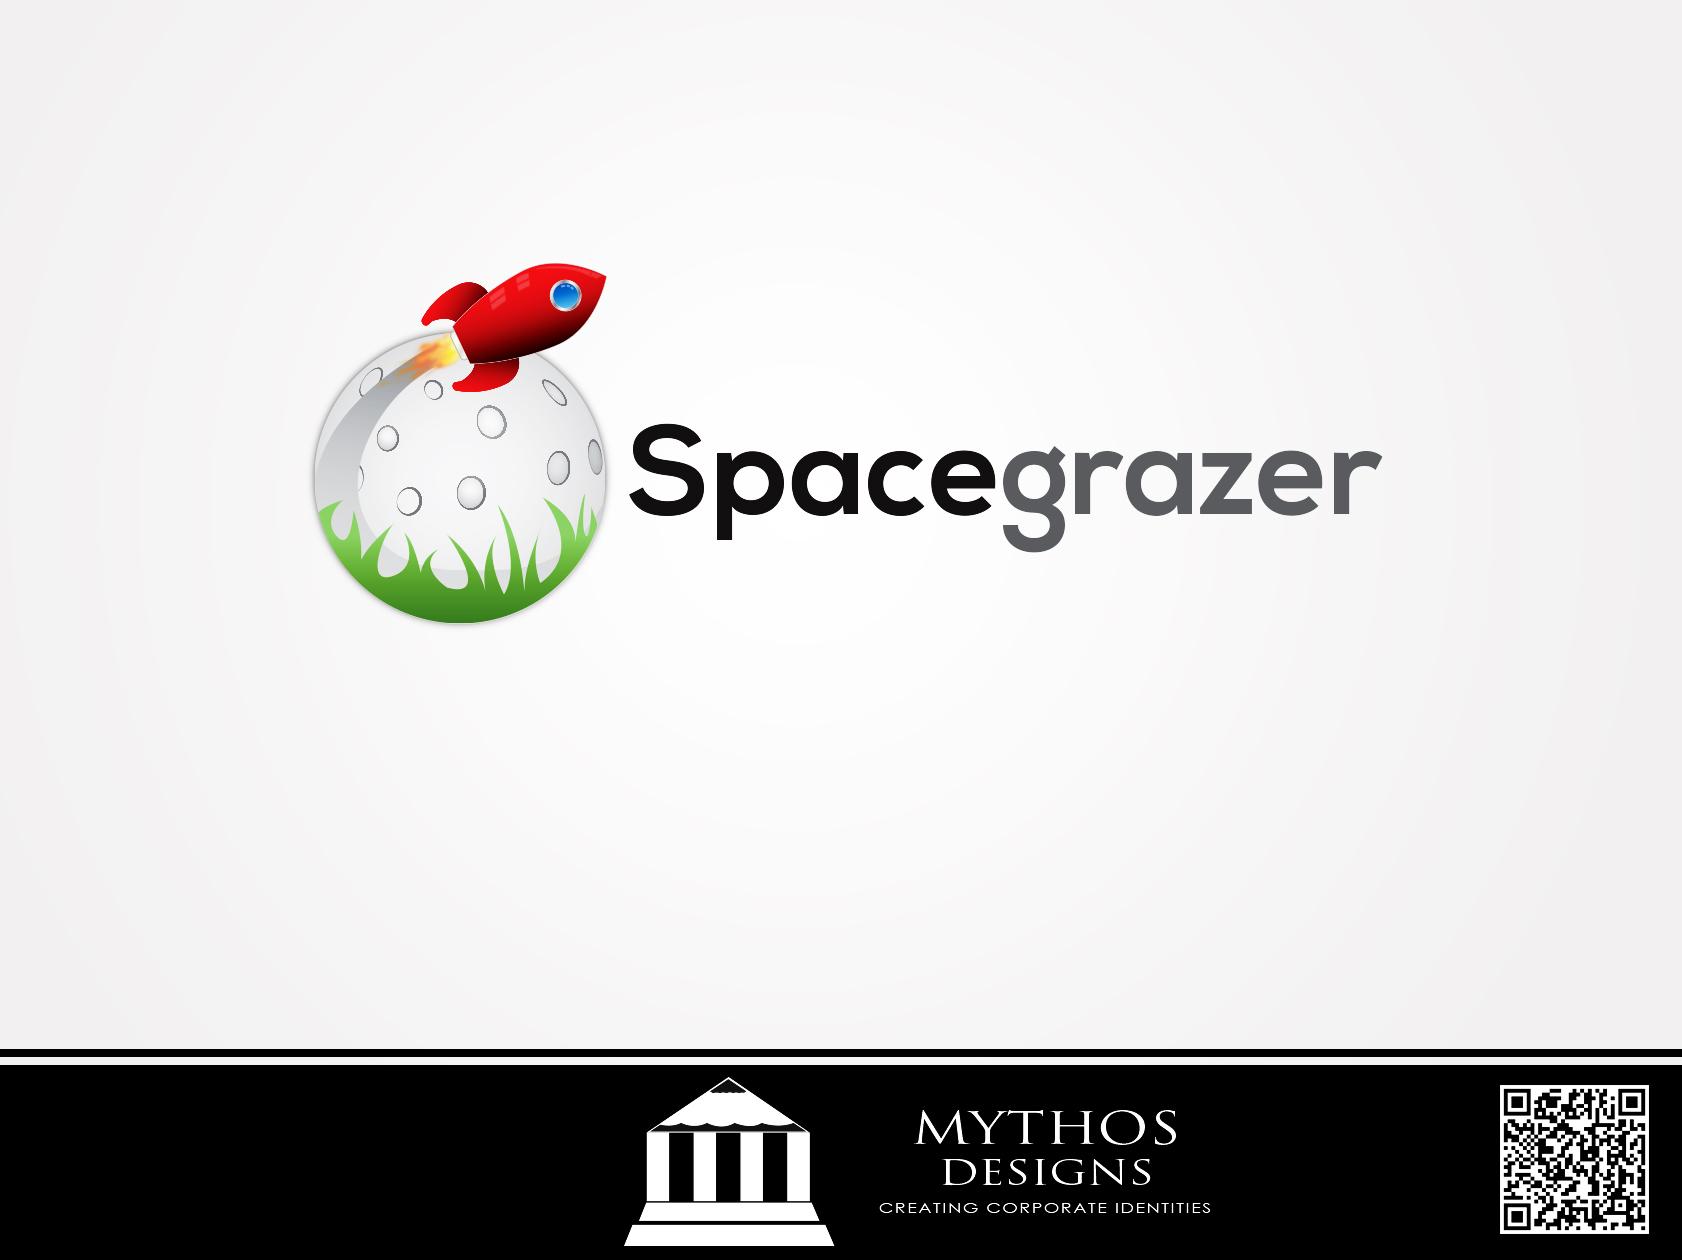 Logo Design by Mythos Designs - Entry No. 107 in the Logo Design Contest Fun Logo Design for Spacegrazer.